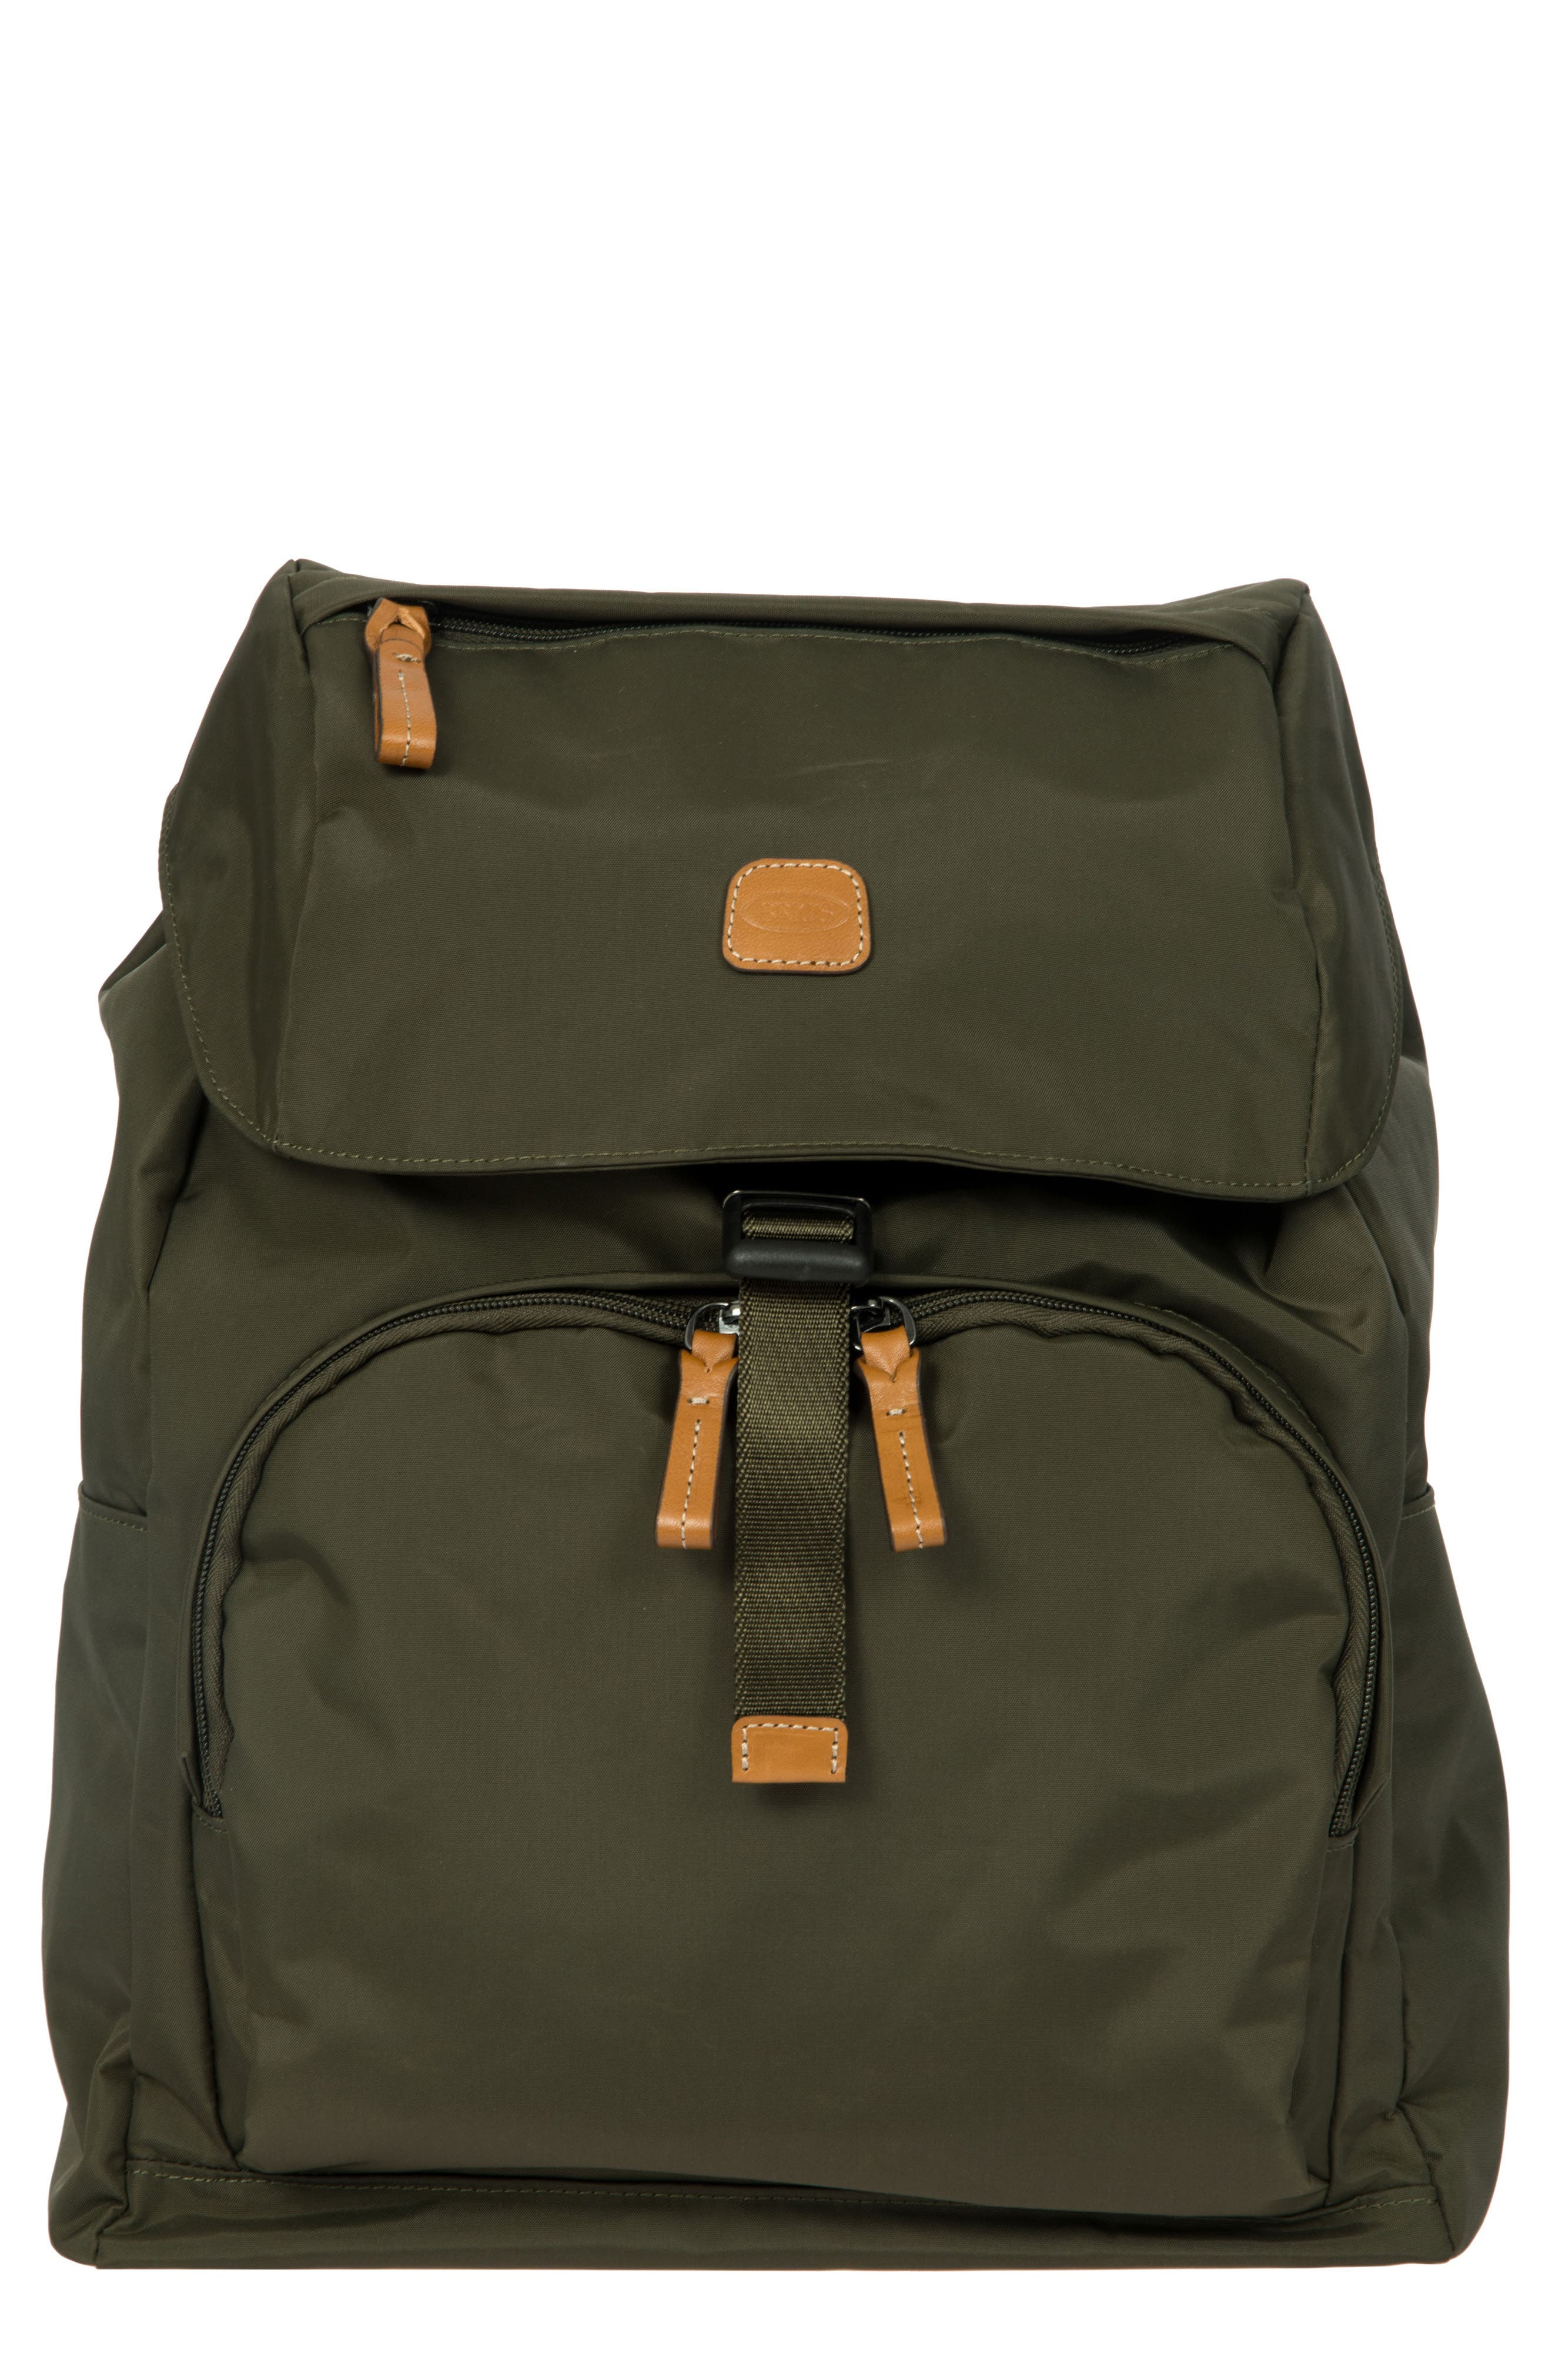 X-Bag Travel Excursion Backpack,                             Main thumbnail 1, color,                             Olive